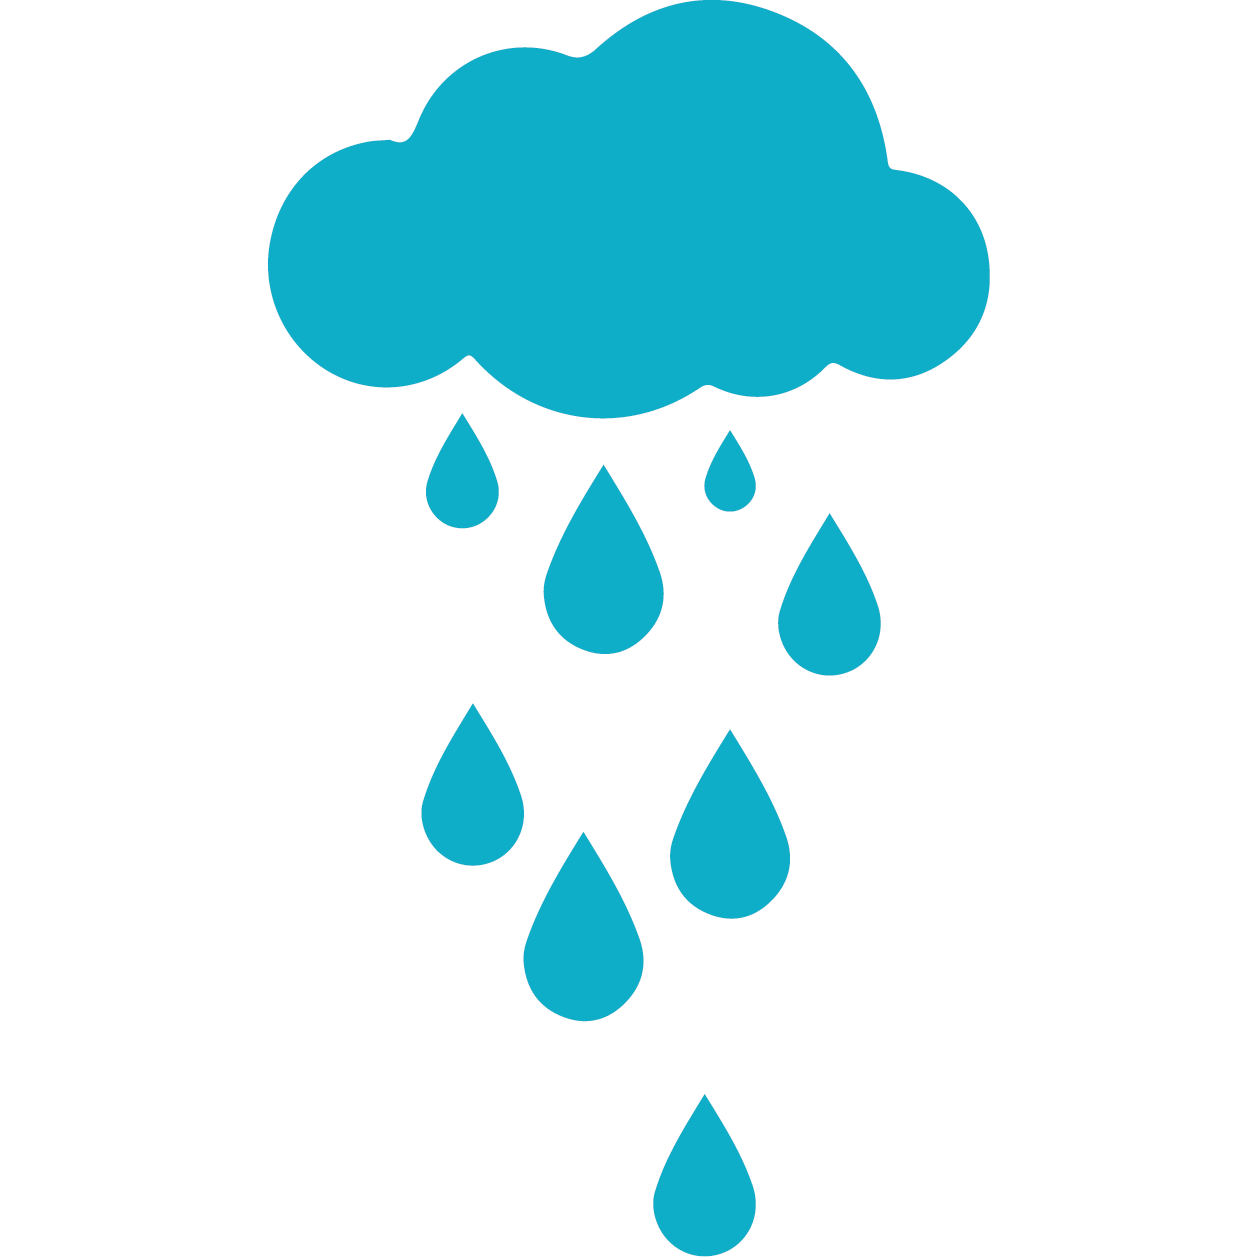 CAIP Strategy 7.0 logo: rain cloud